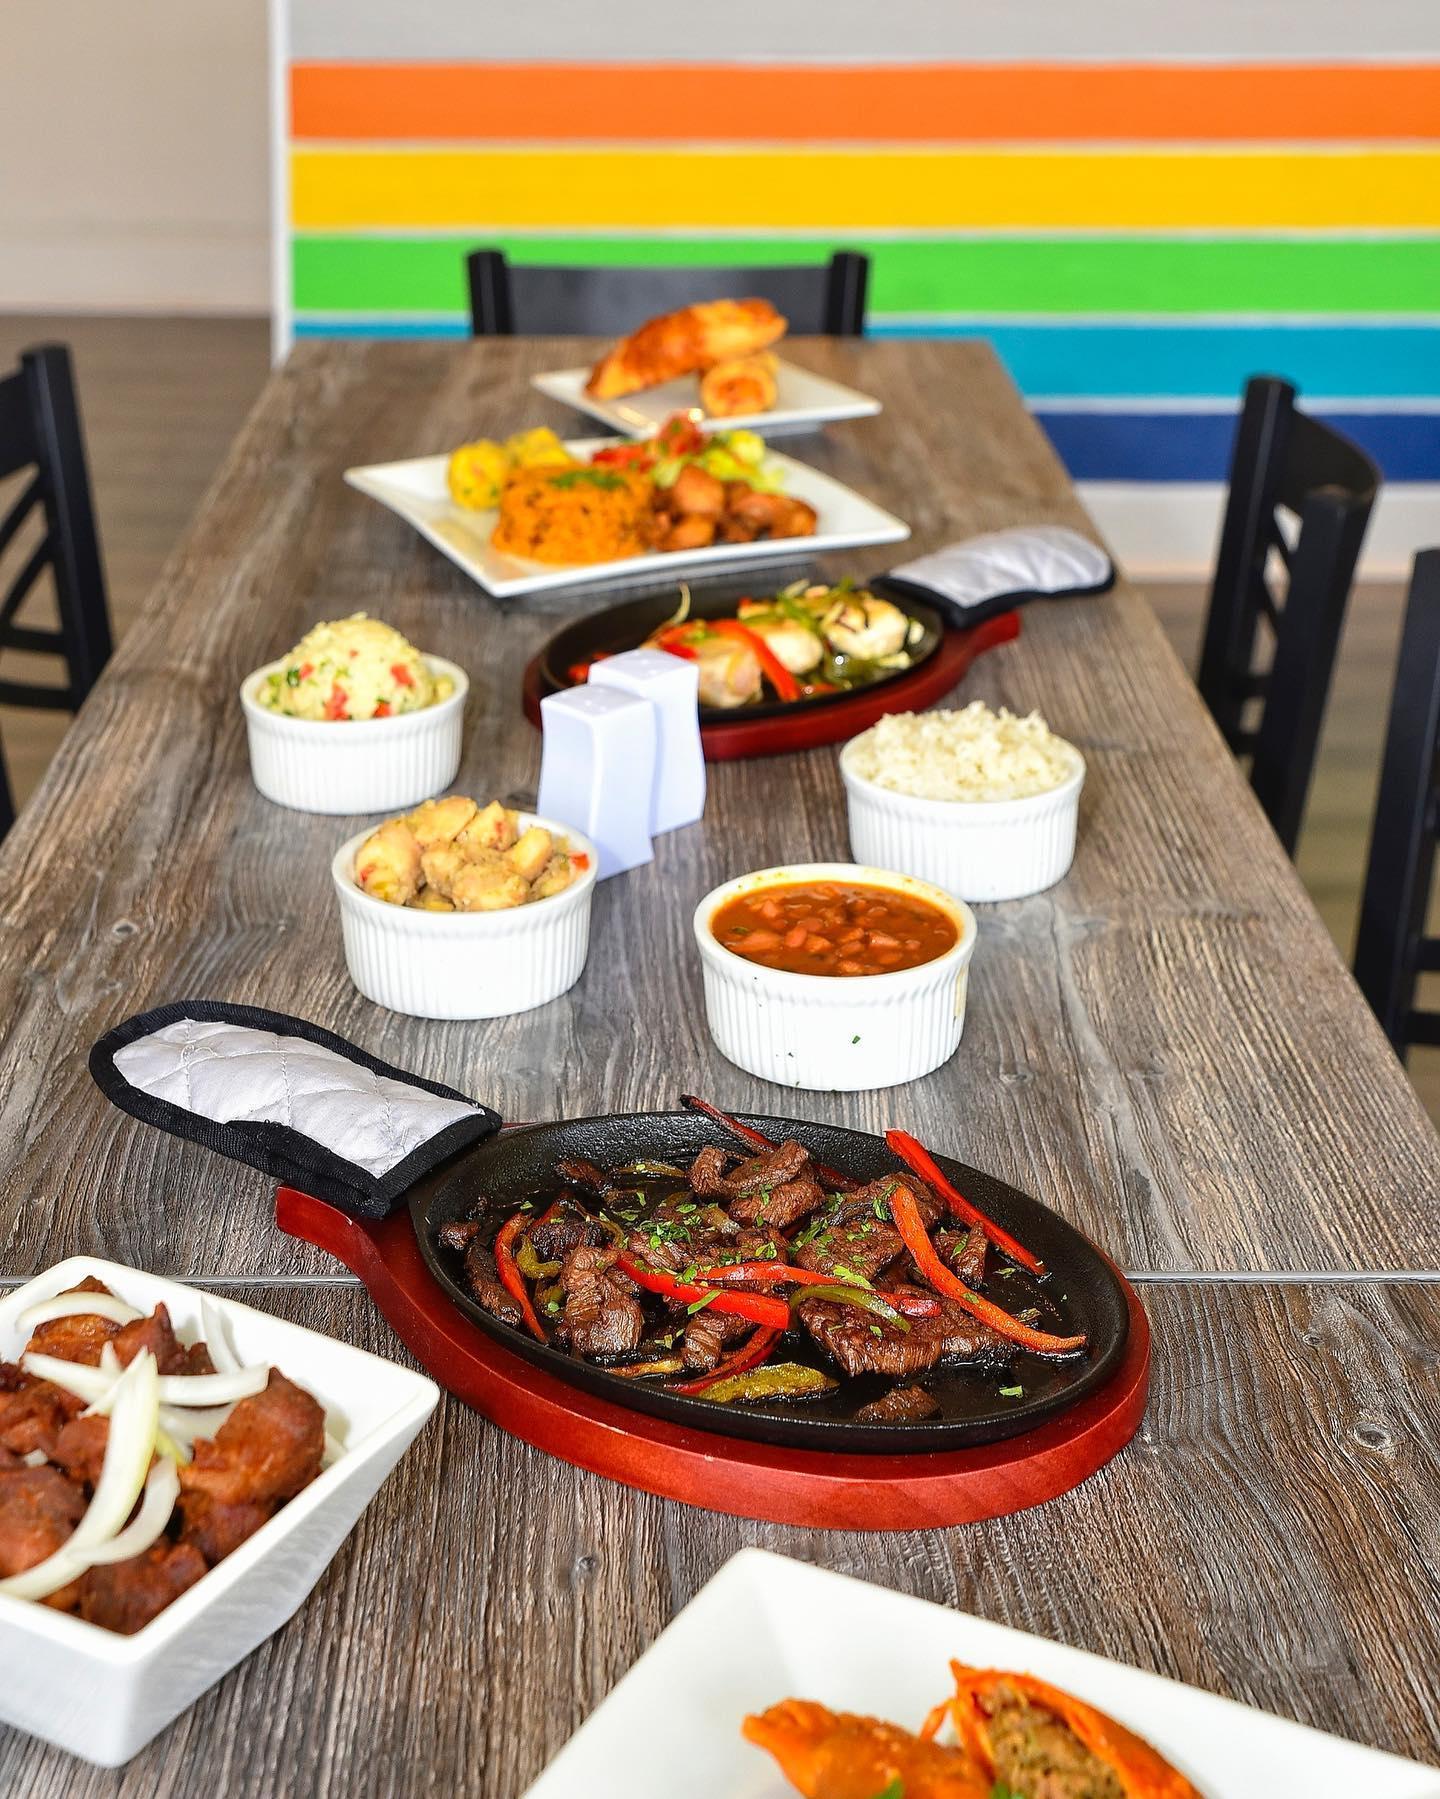 Puerto Rican cuisine is the centerpiece at The Borikén Restaurant in Mount Morris